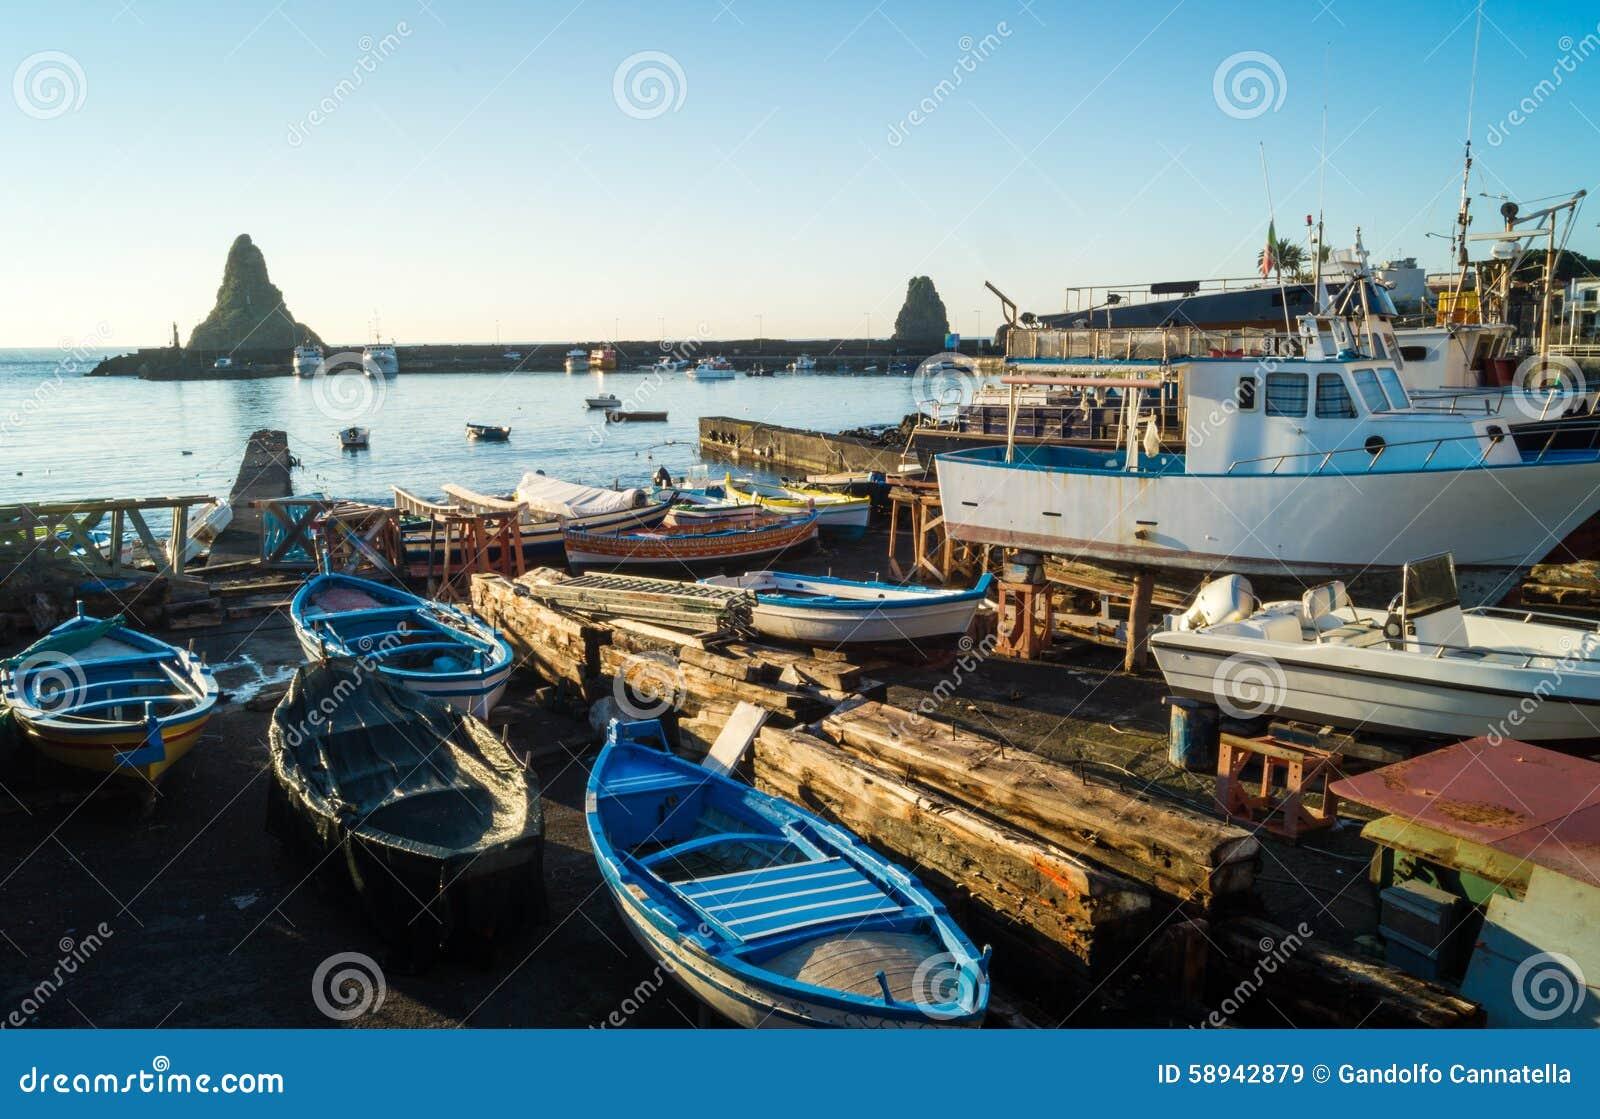 Acitrezza harbor with old boat